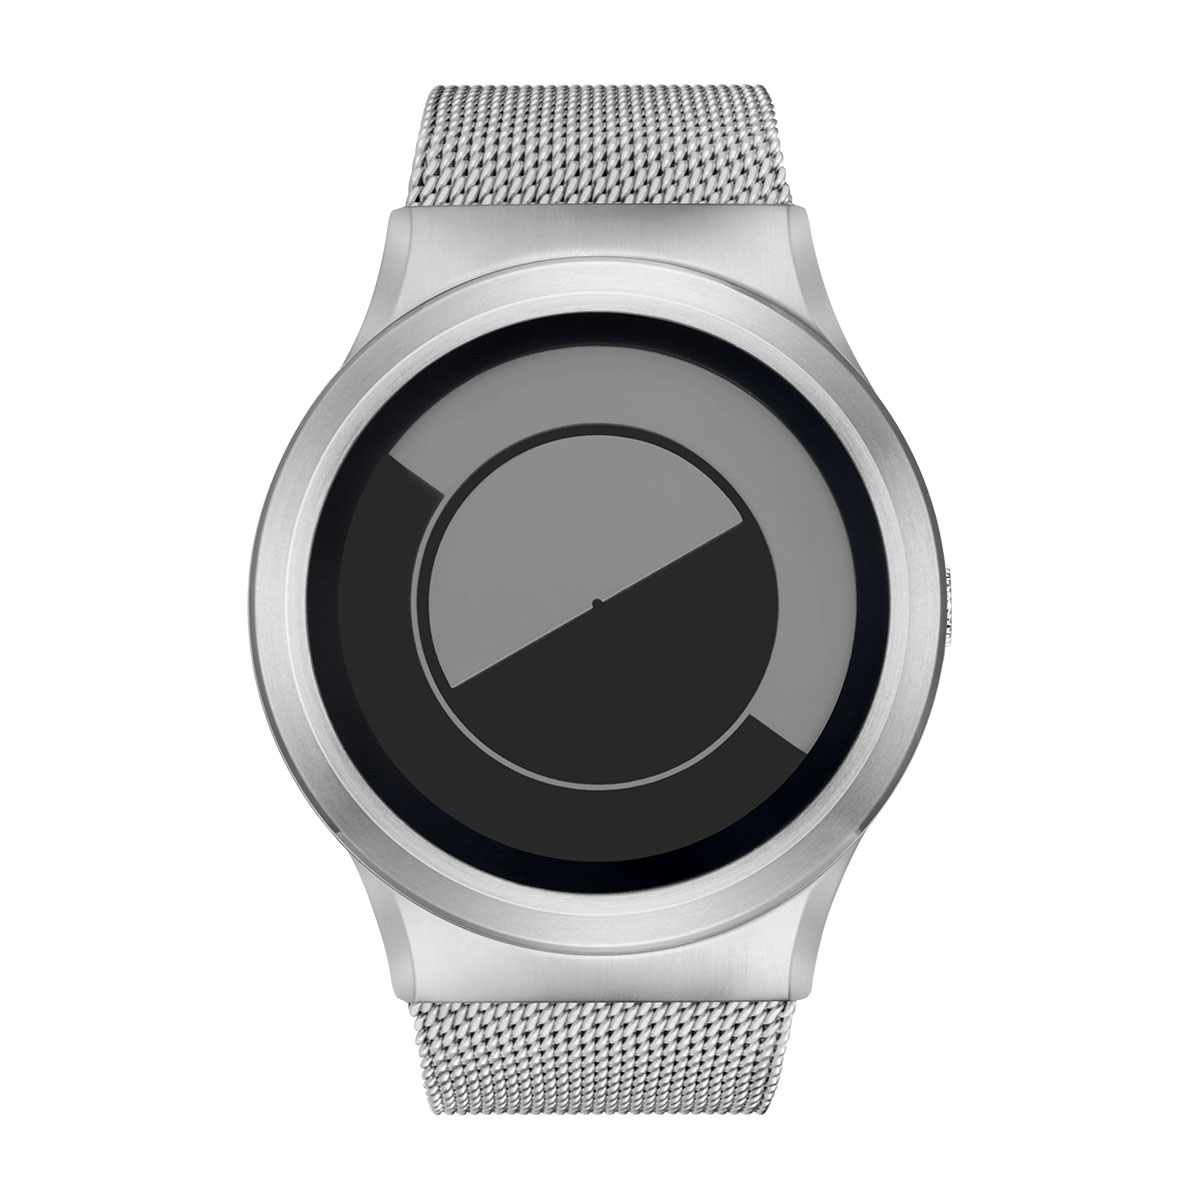 ZEROO QUARTER MOON ゼロ 電池式クォーツ 腕時計 [W08035B01SM01] グレイ